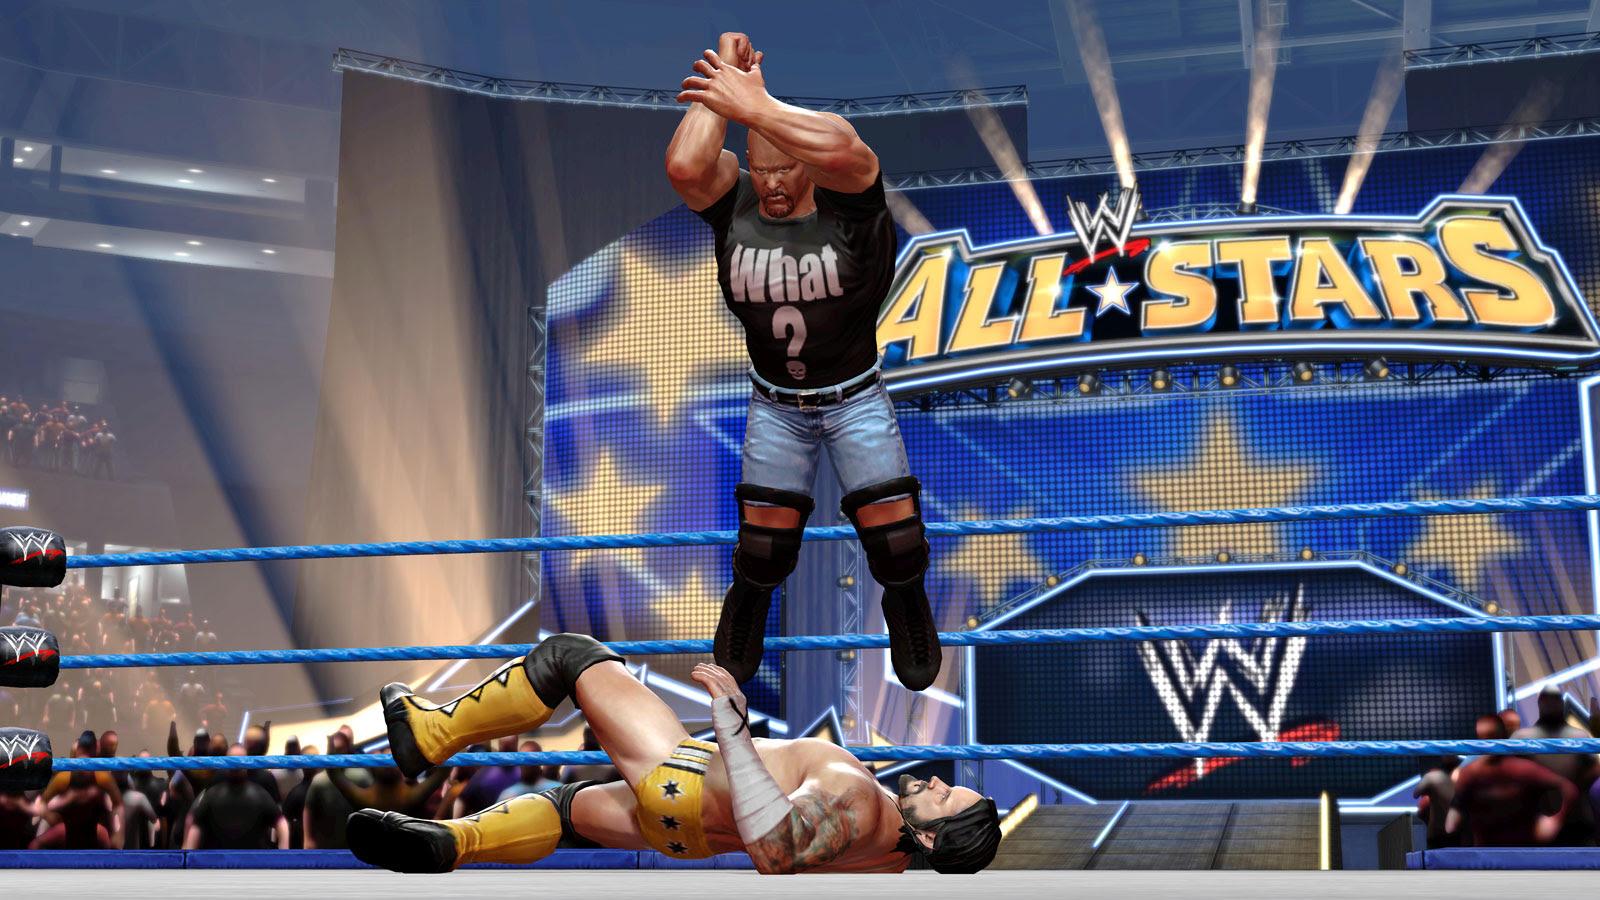 http://www.videogamesblogger.com/wp-content/uploads/2011/02/wwe-all-stars-wrestling-screenshot.jpg